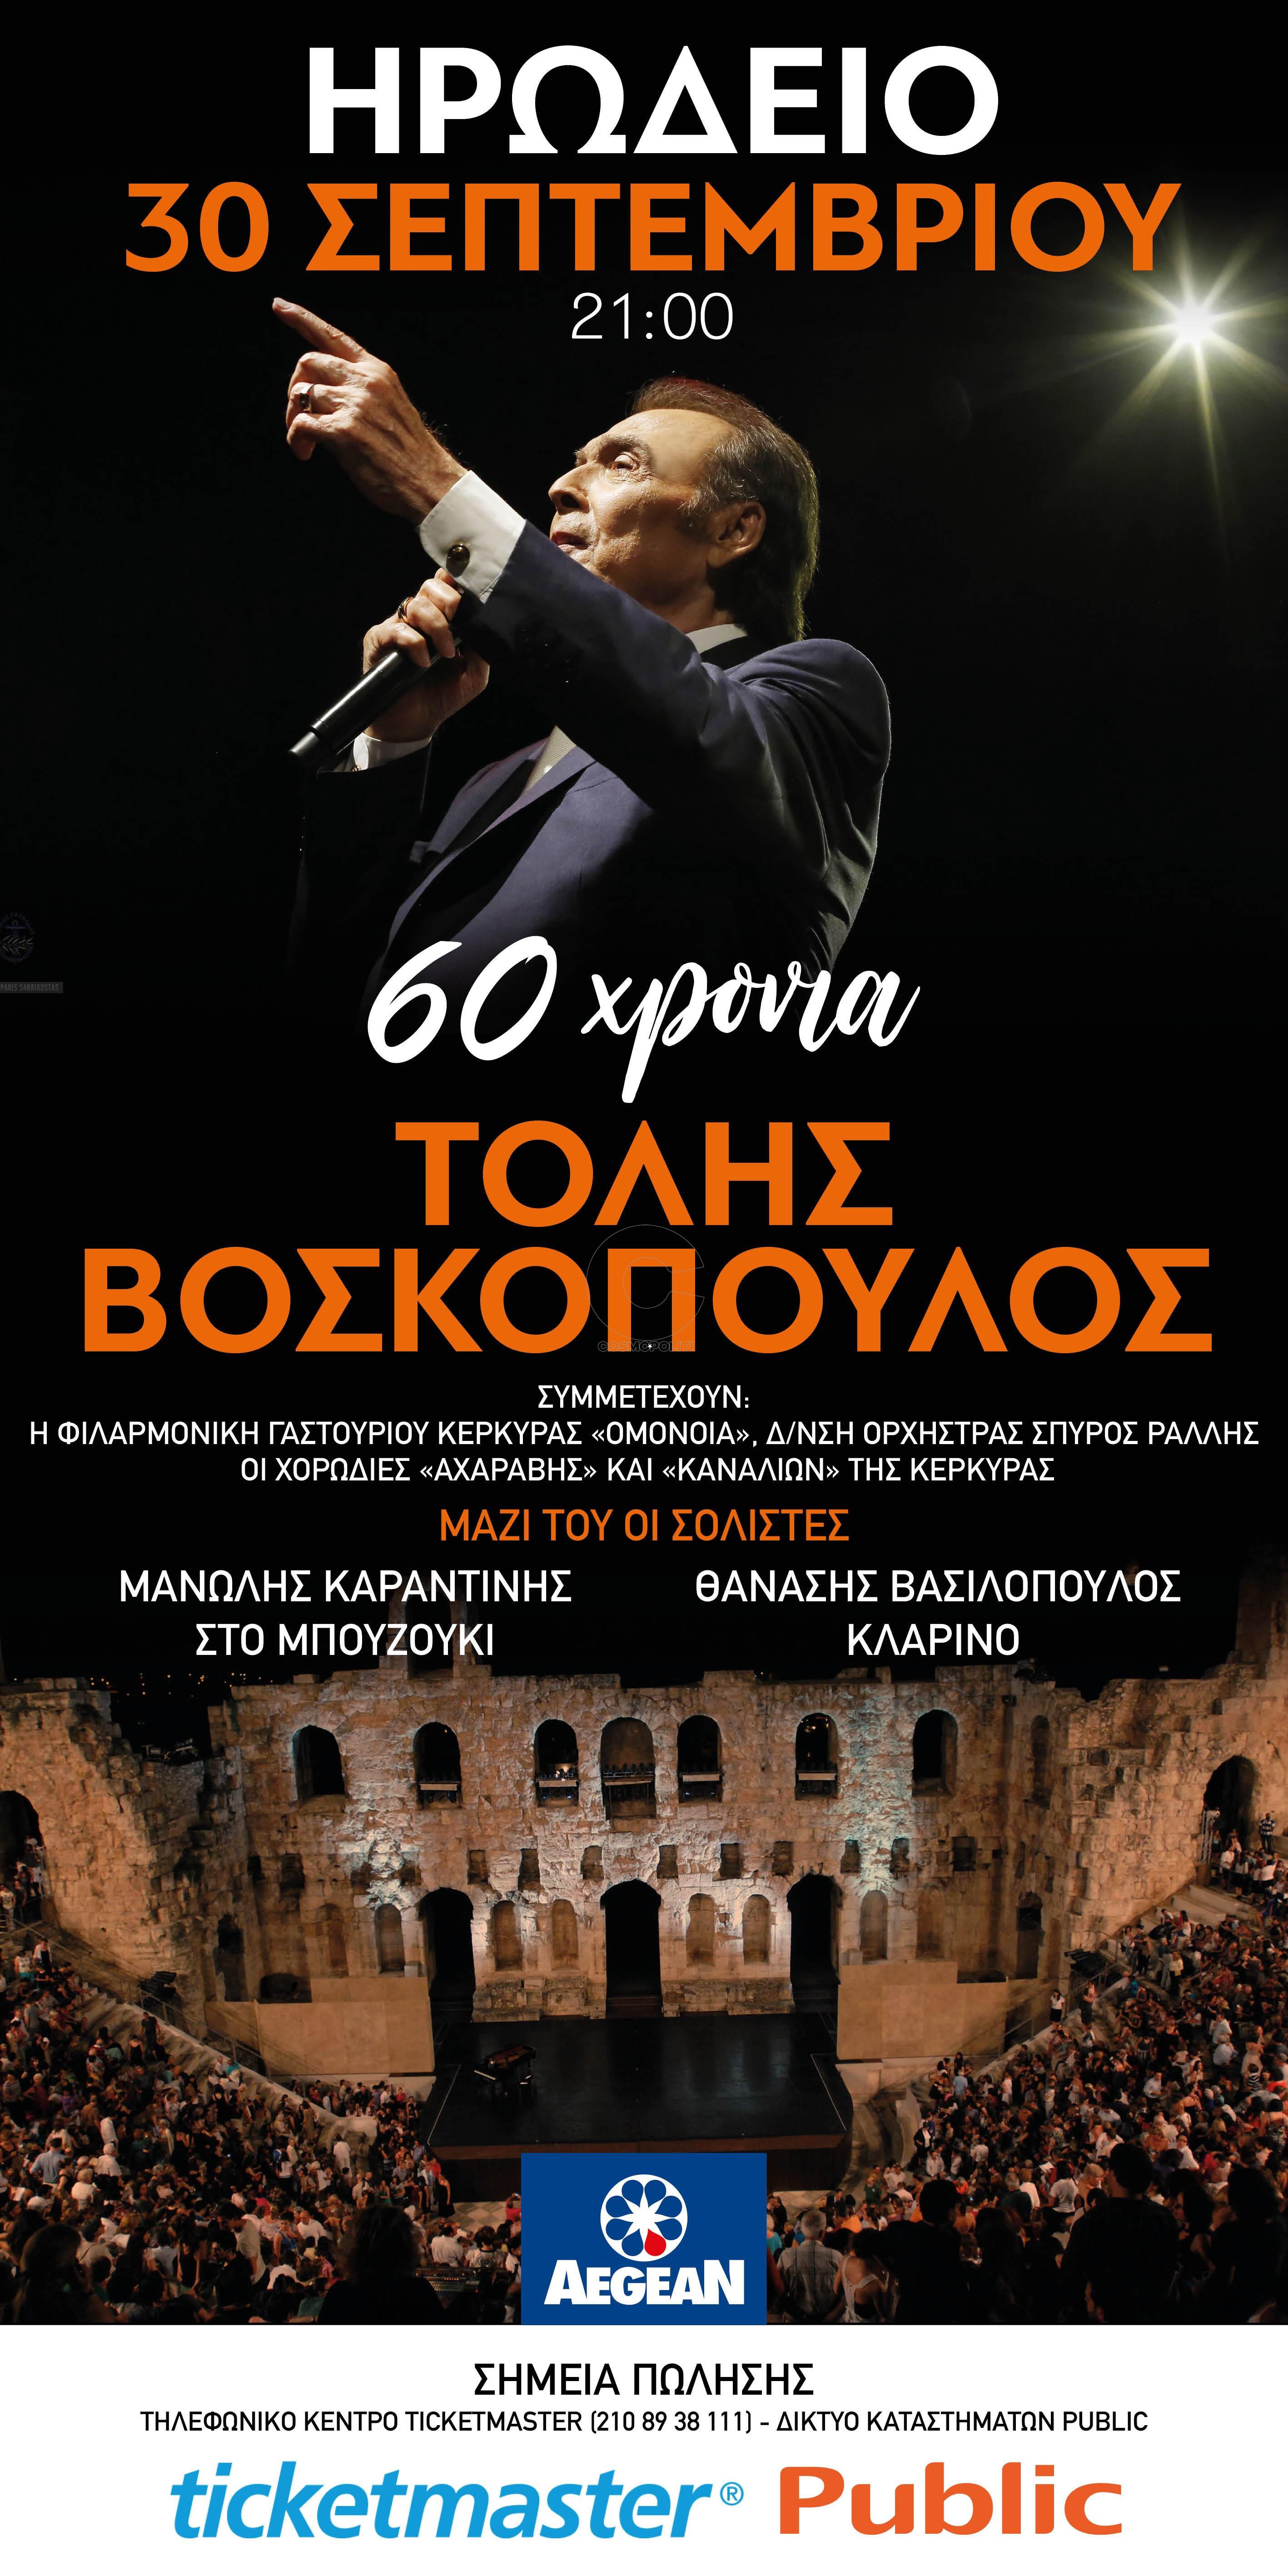 Voskopoulos_Hrodeio